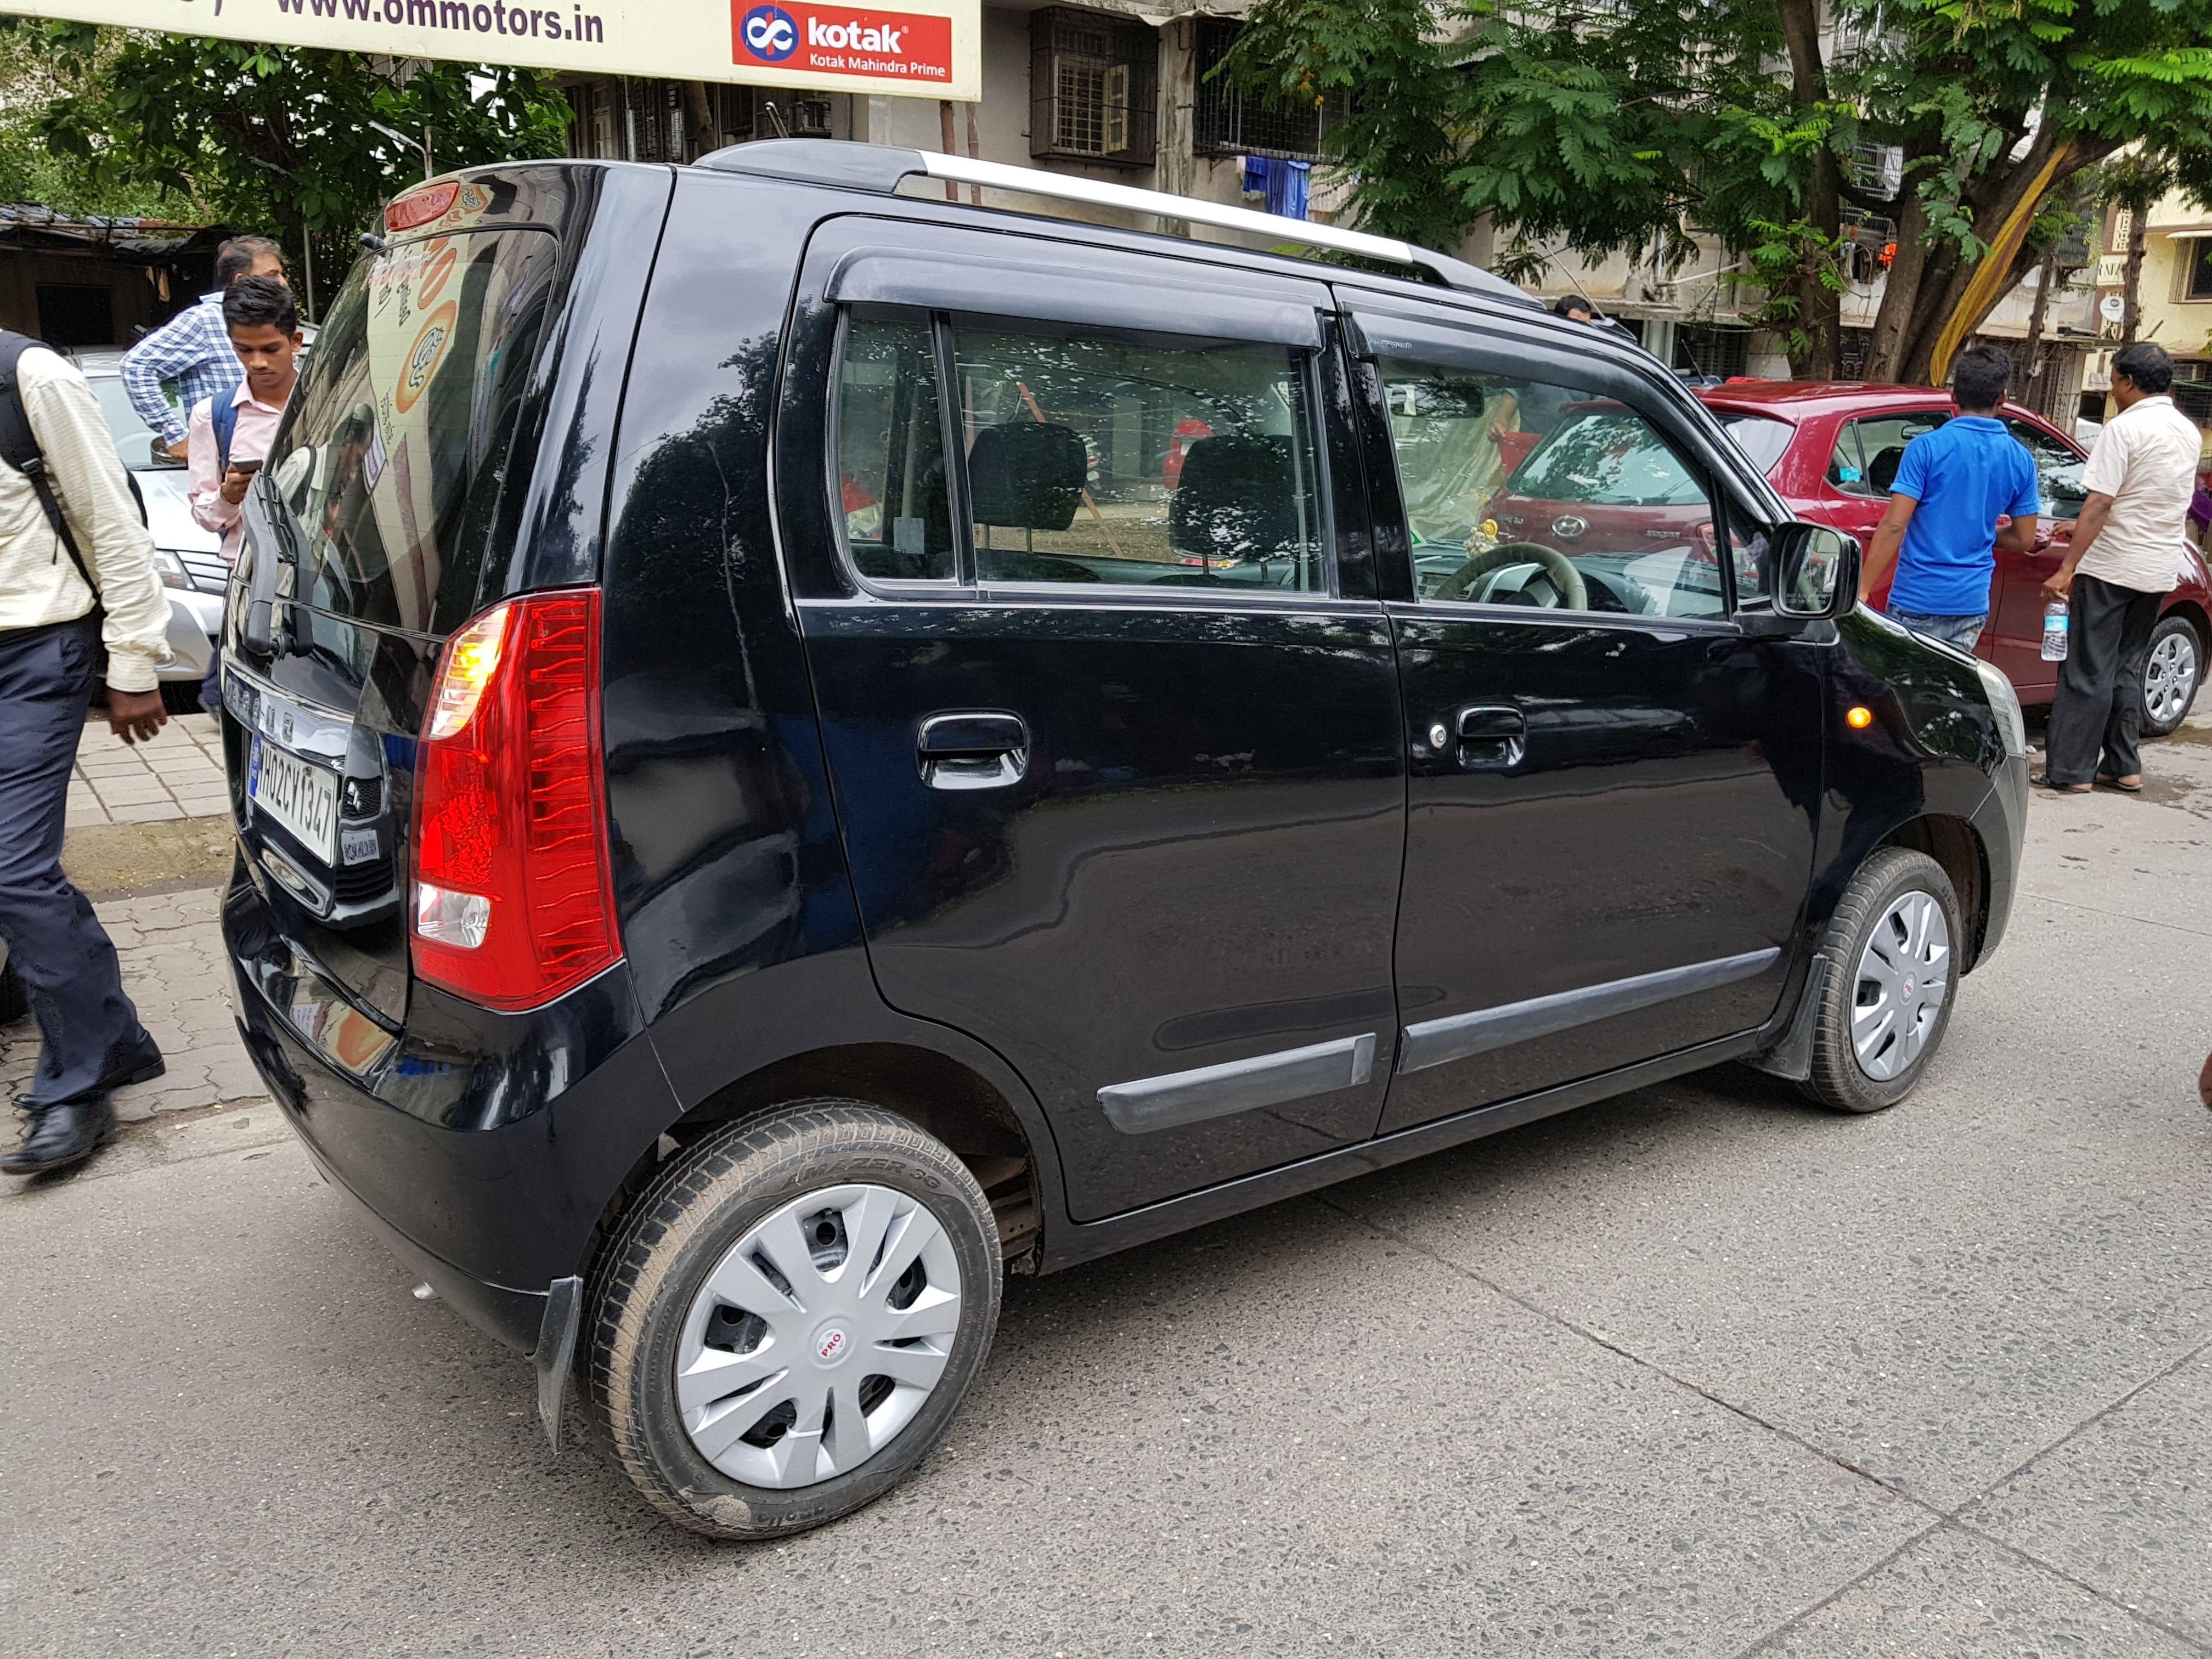 Maruti Wagon R 2010-2012 VXi BSII